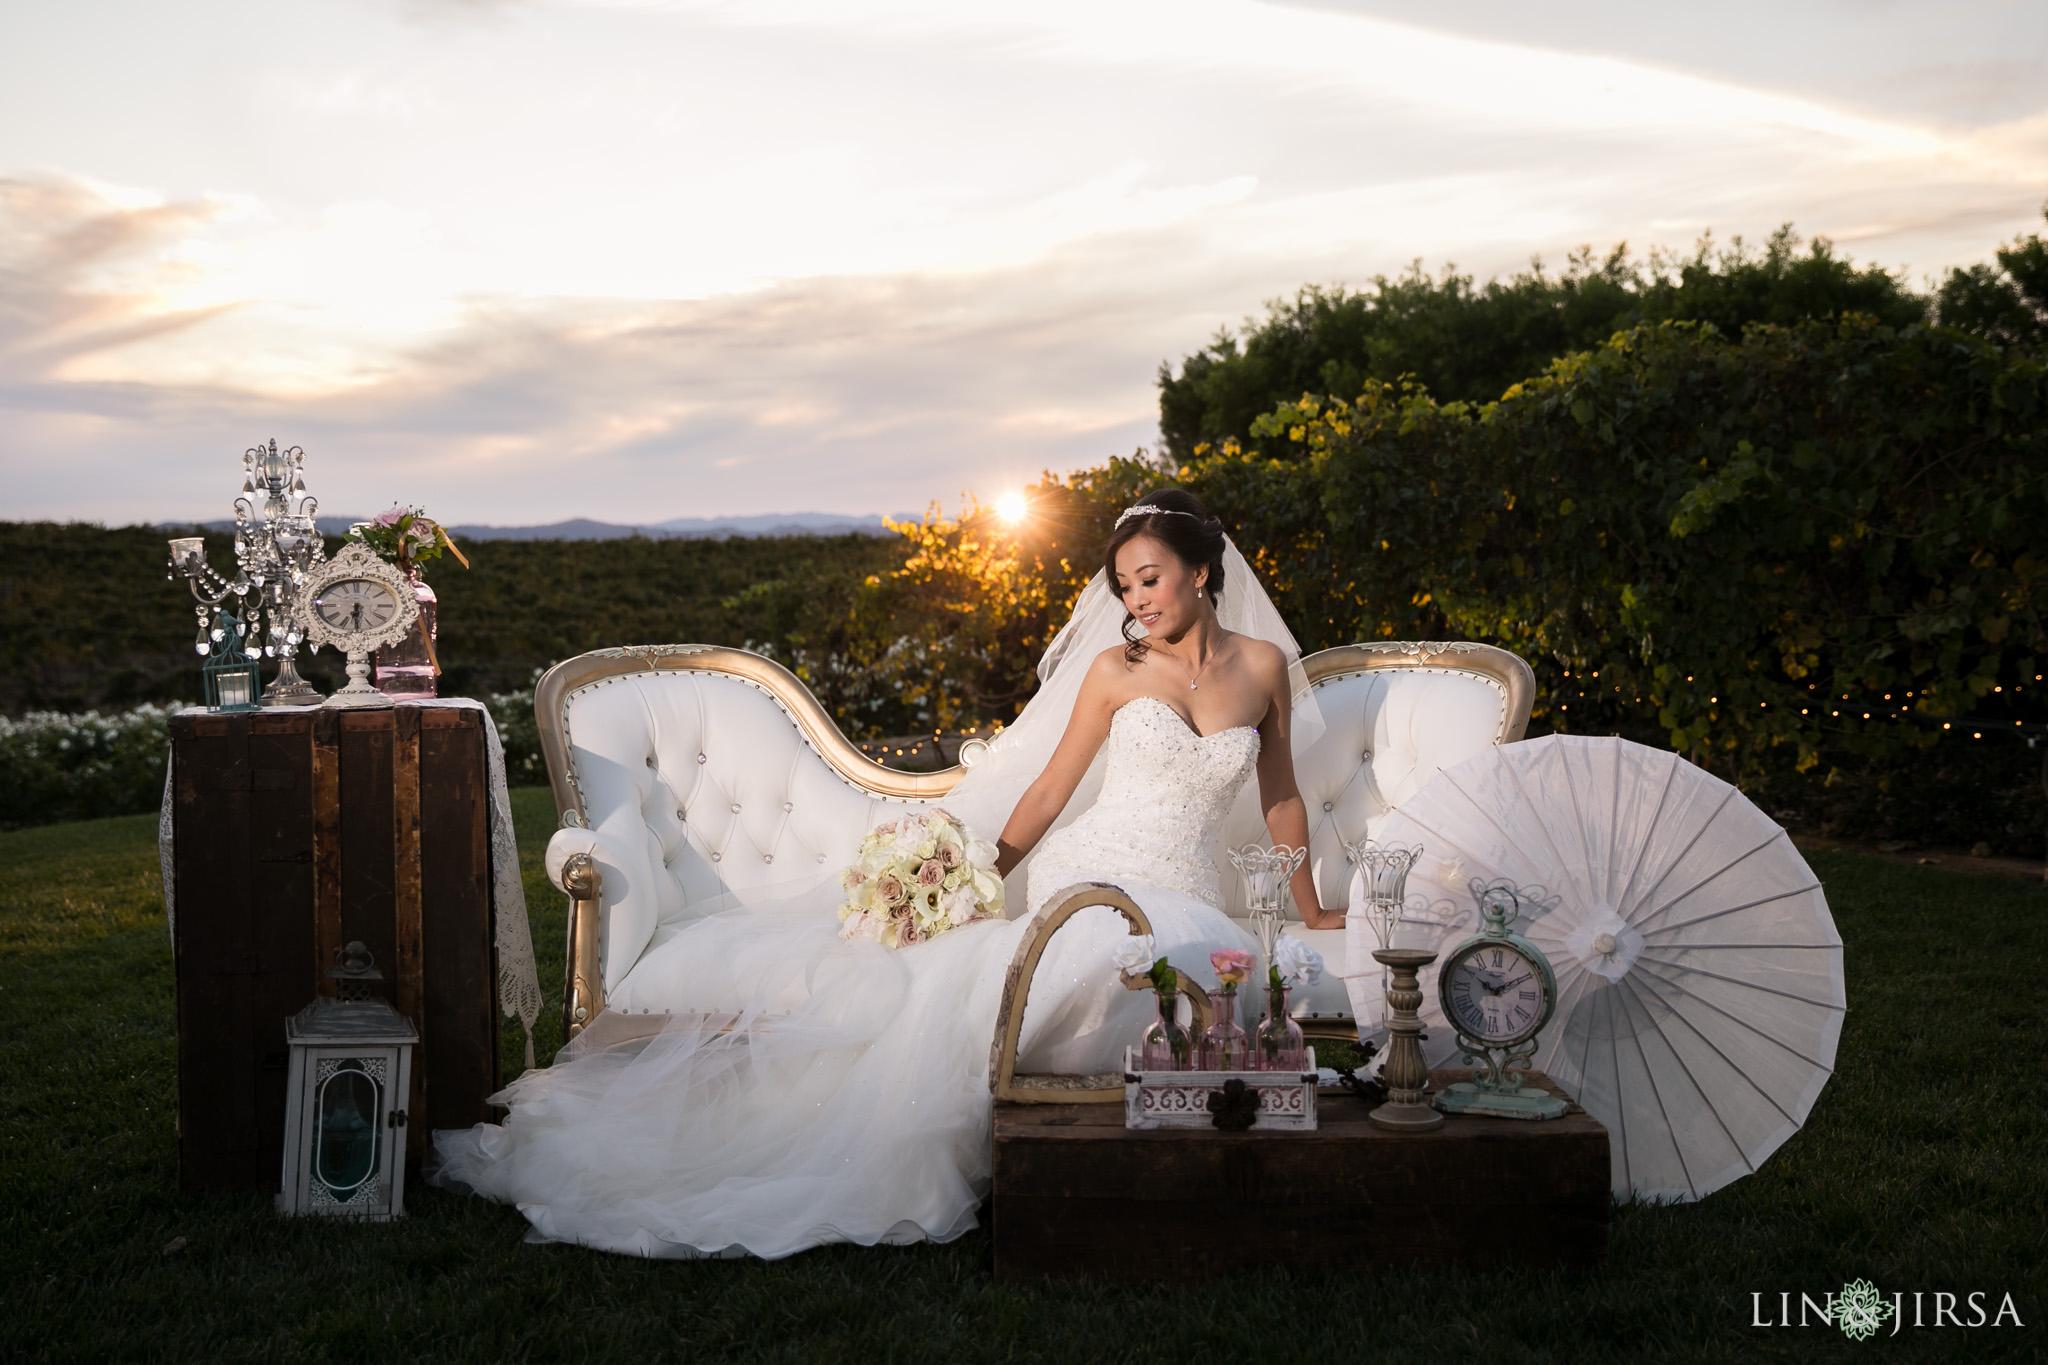 15-villa-de-amore-temecula-wedding-photography